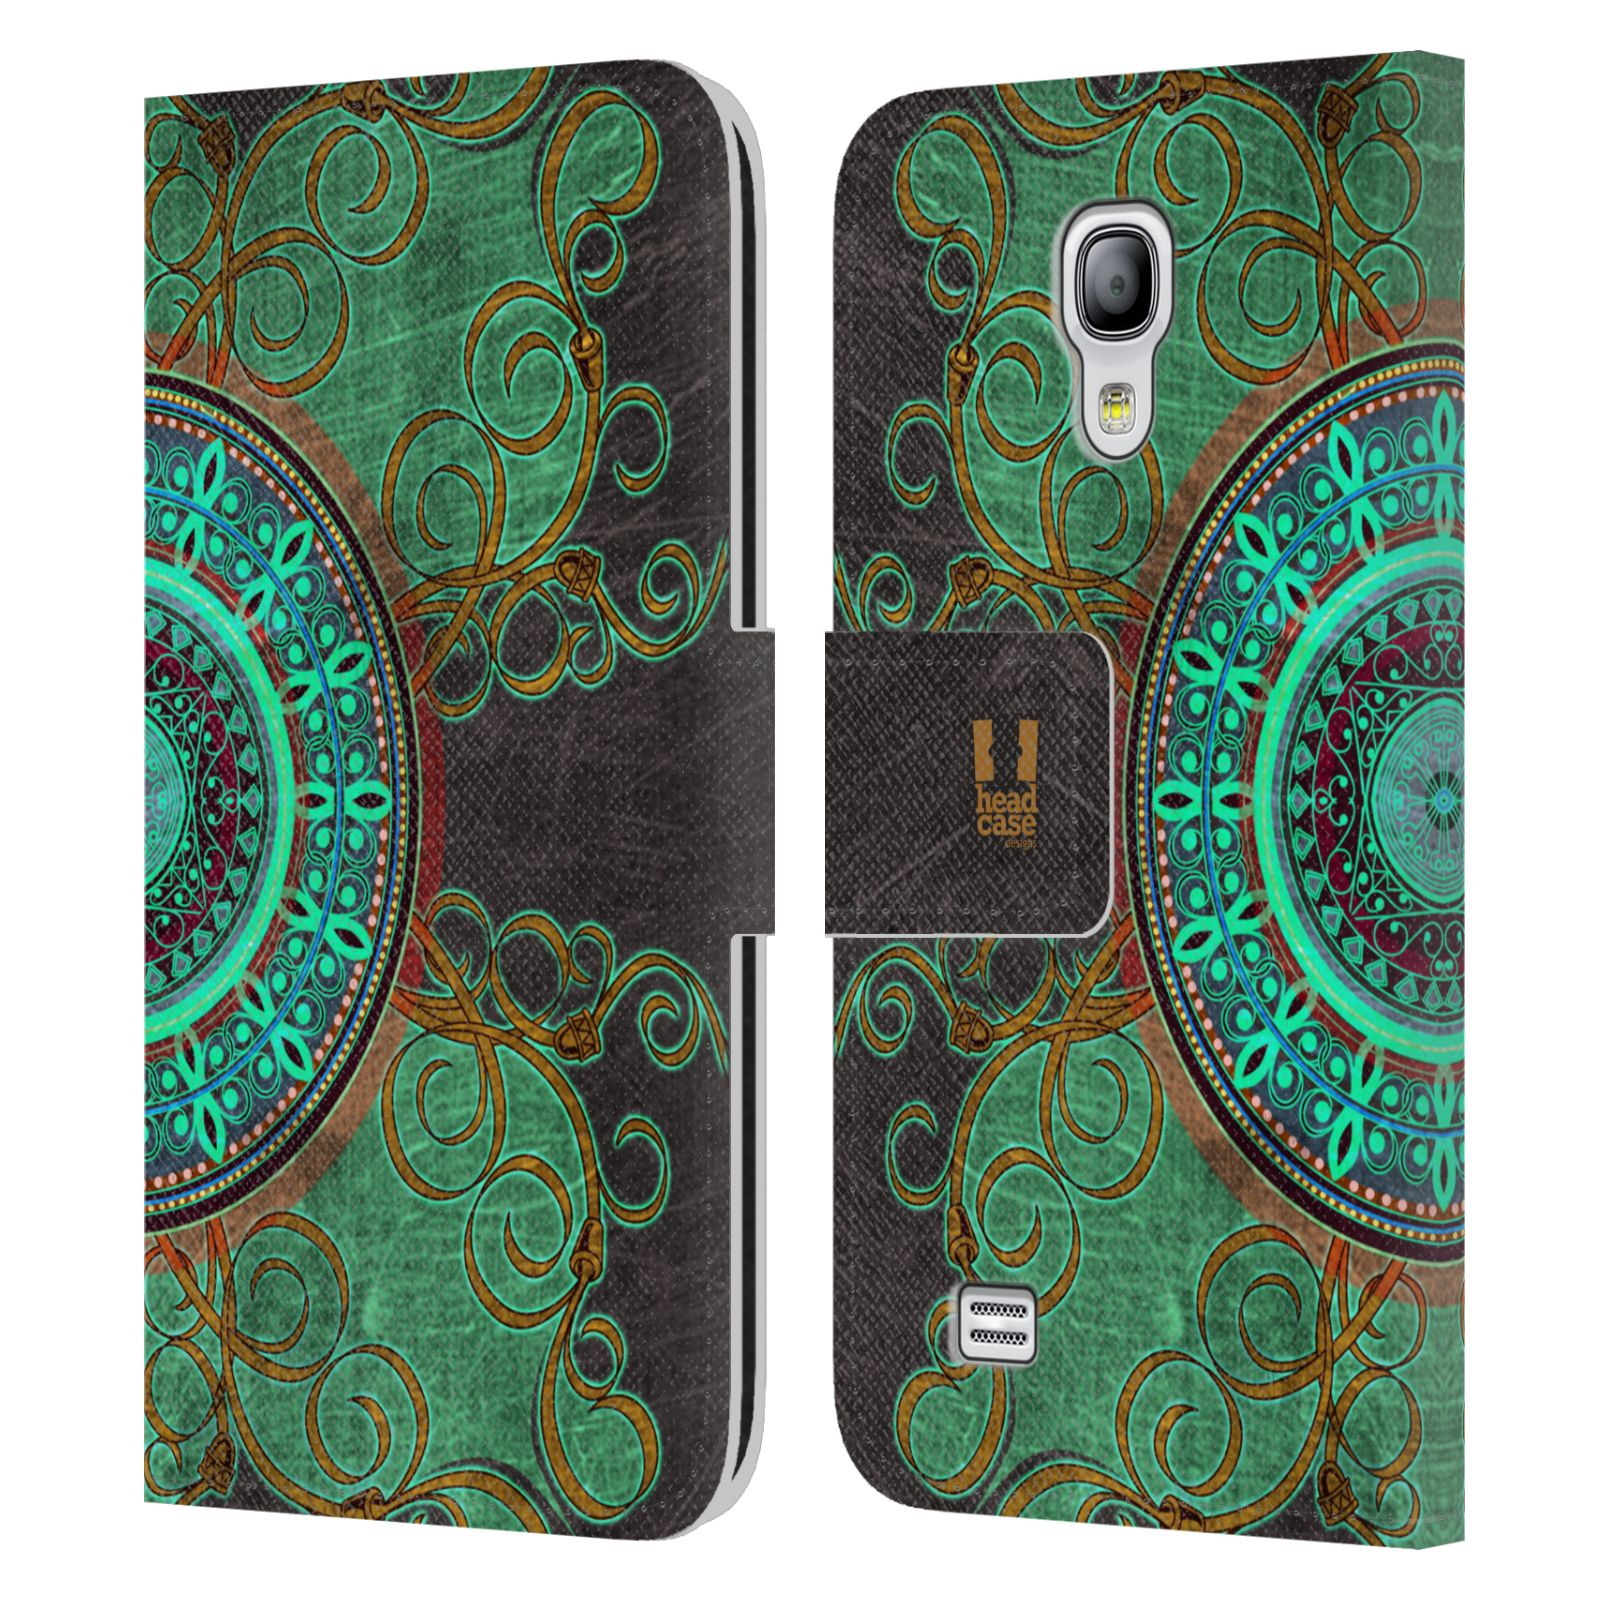 HEAD CASE Flipové pouzdro pro mobil Samsung Galaxy S4 MINI / S4 MINI DUOS ARABESKA mandala zelená